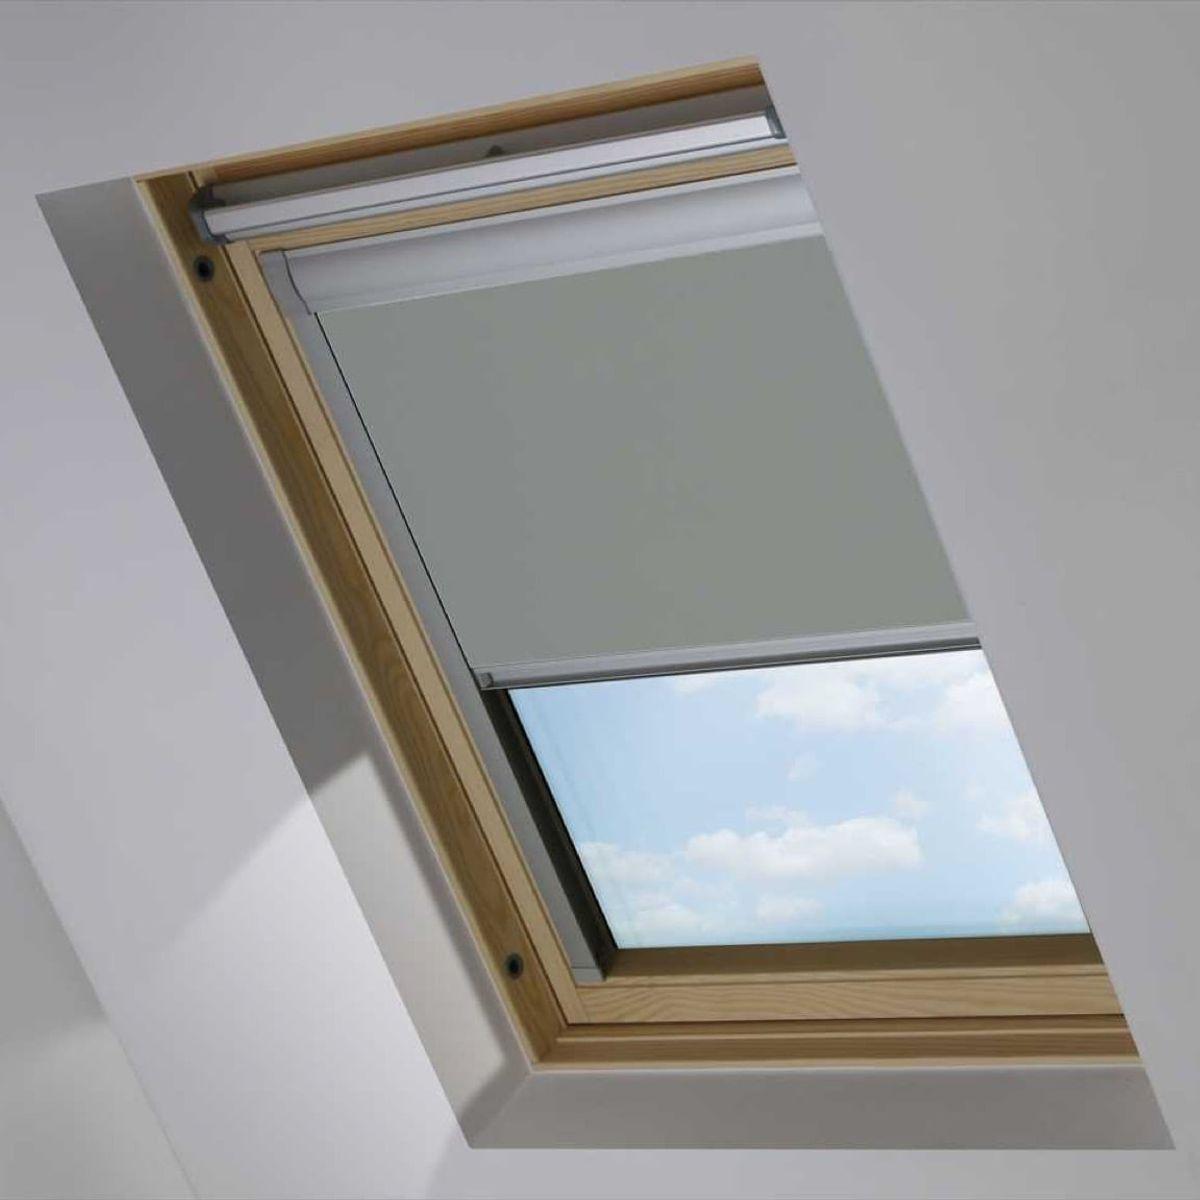 Ouro Dachfensterrollo für Roto 649 HOLZ 7/11, Smouldering Charcoal